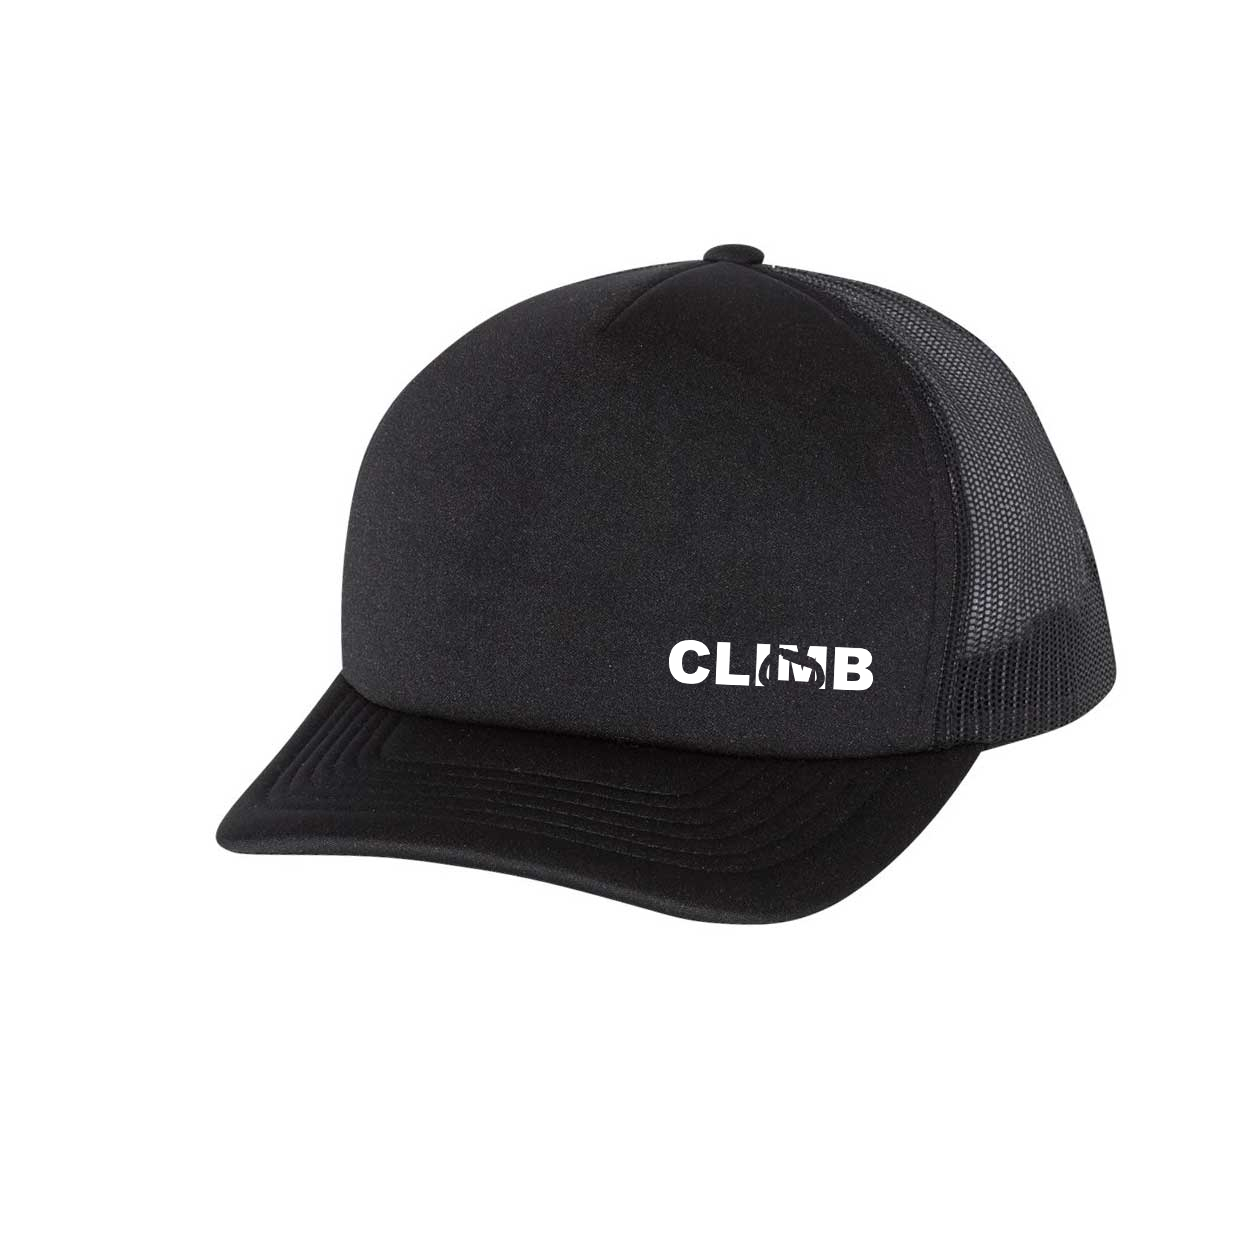 Climb Carabiner Logo Night Out Premium Foam Trucker Snapback Hat Black (White Logo)